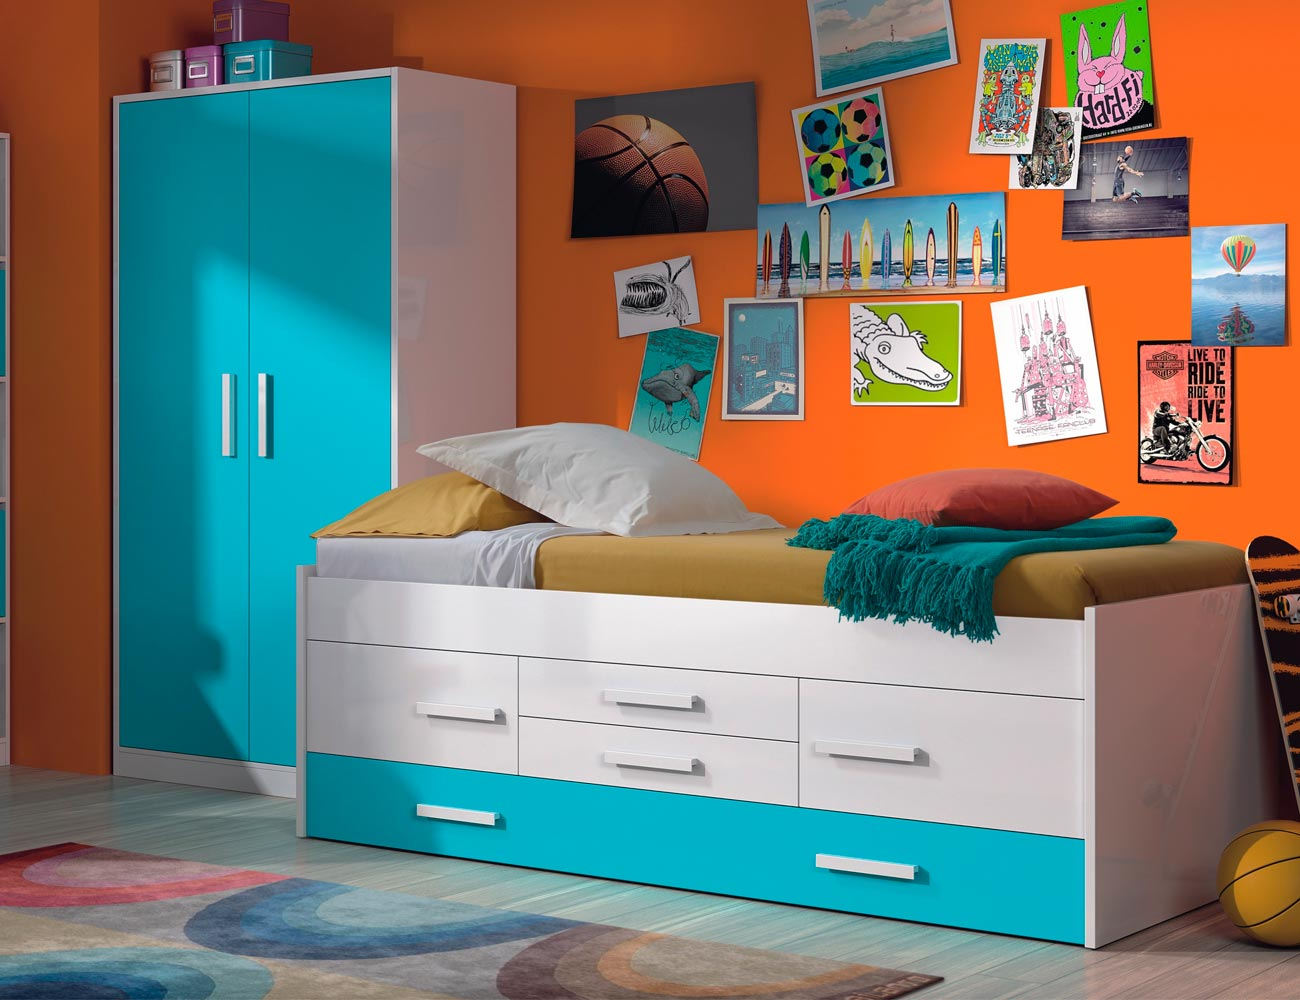 Dormitorio juvenil cama nido armario azul